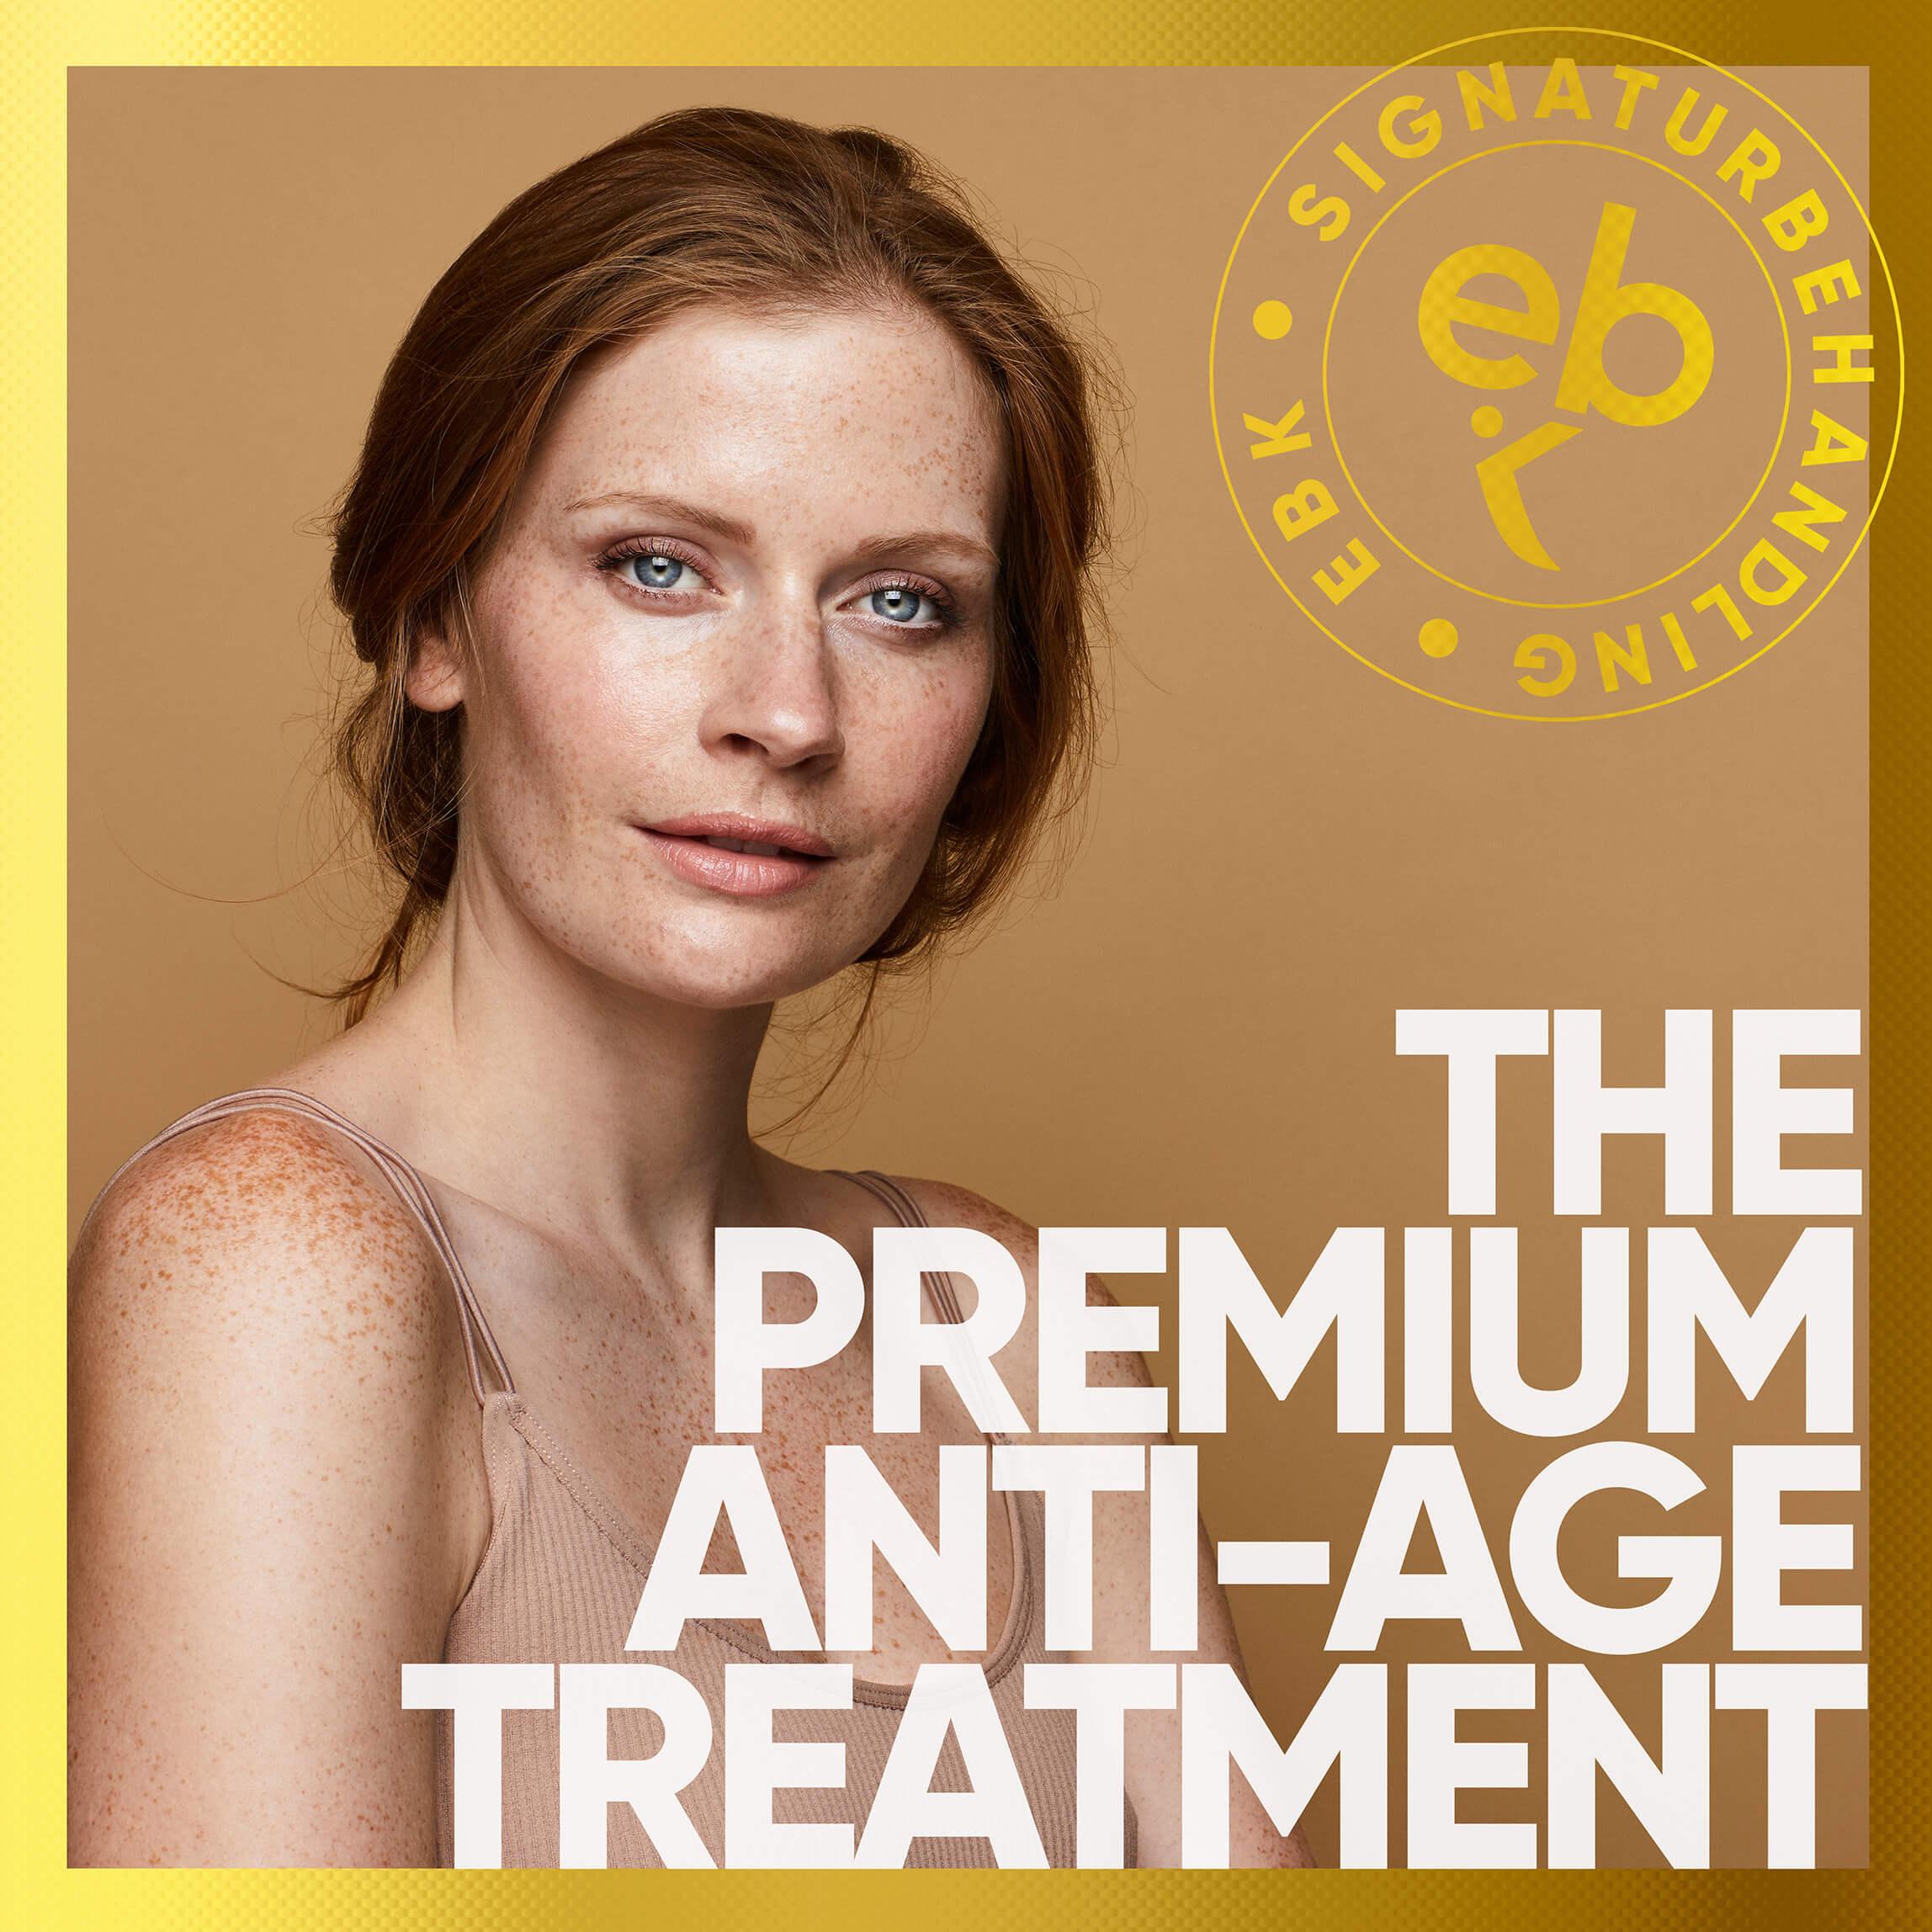 THE PREMIUM ANTI-AGE TREATMENT